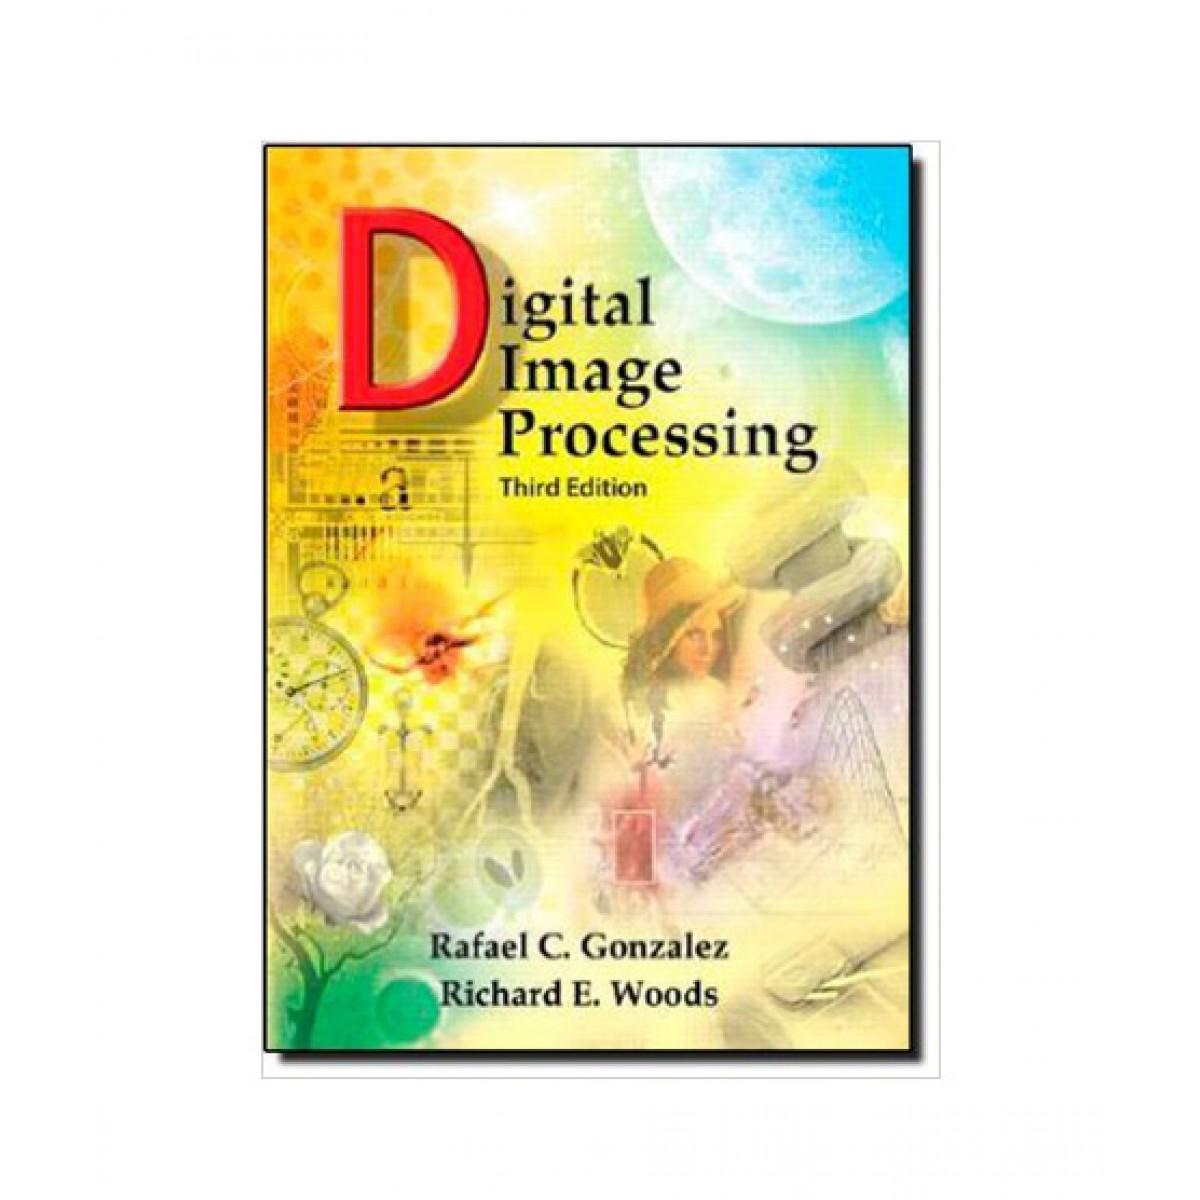 Digital Image Processing Gonzalez Full Book